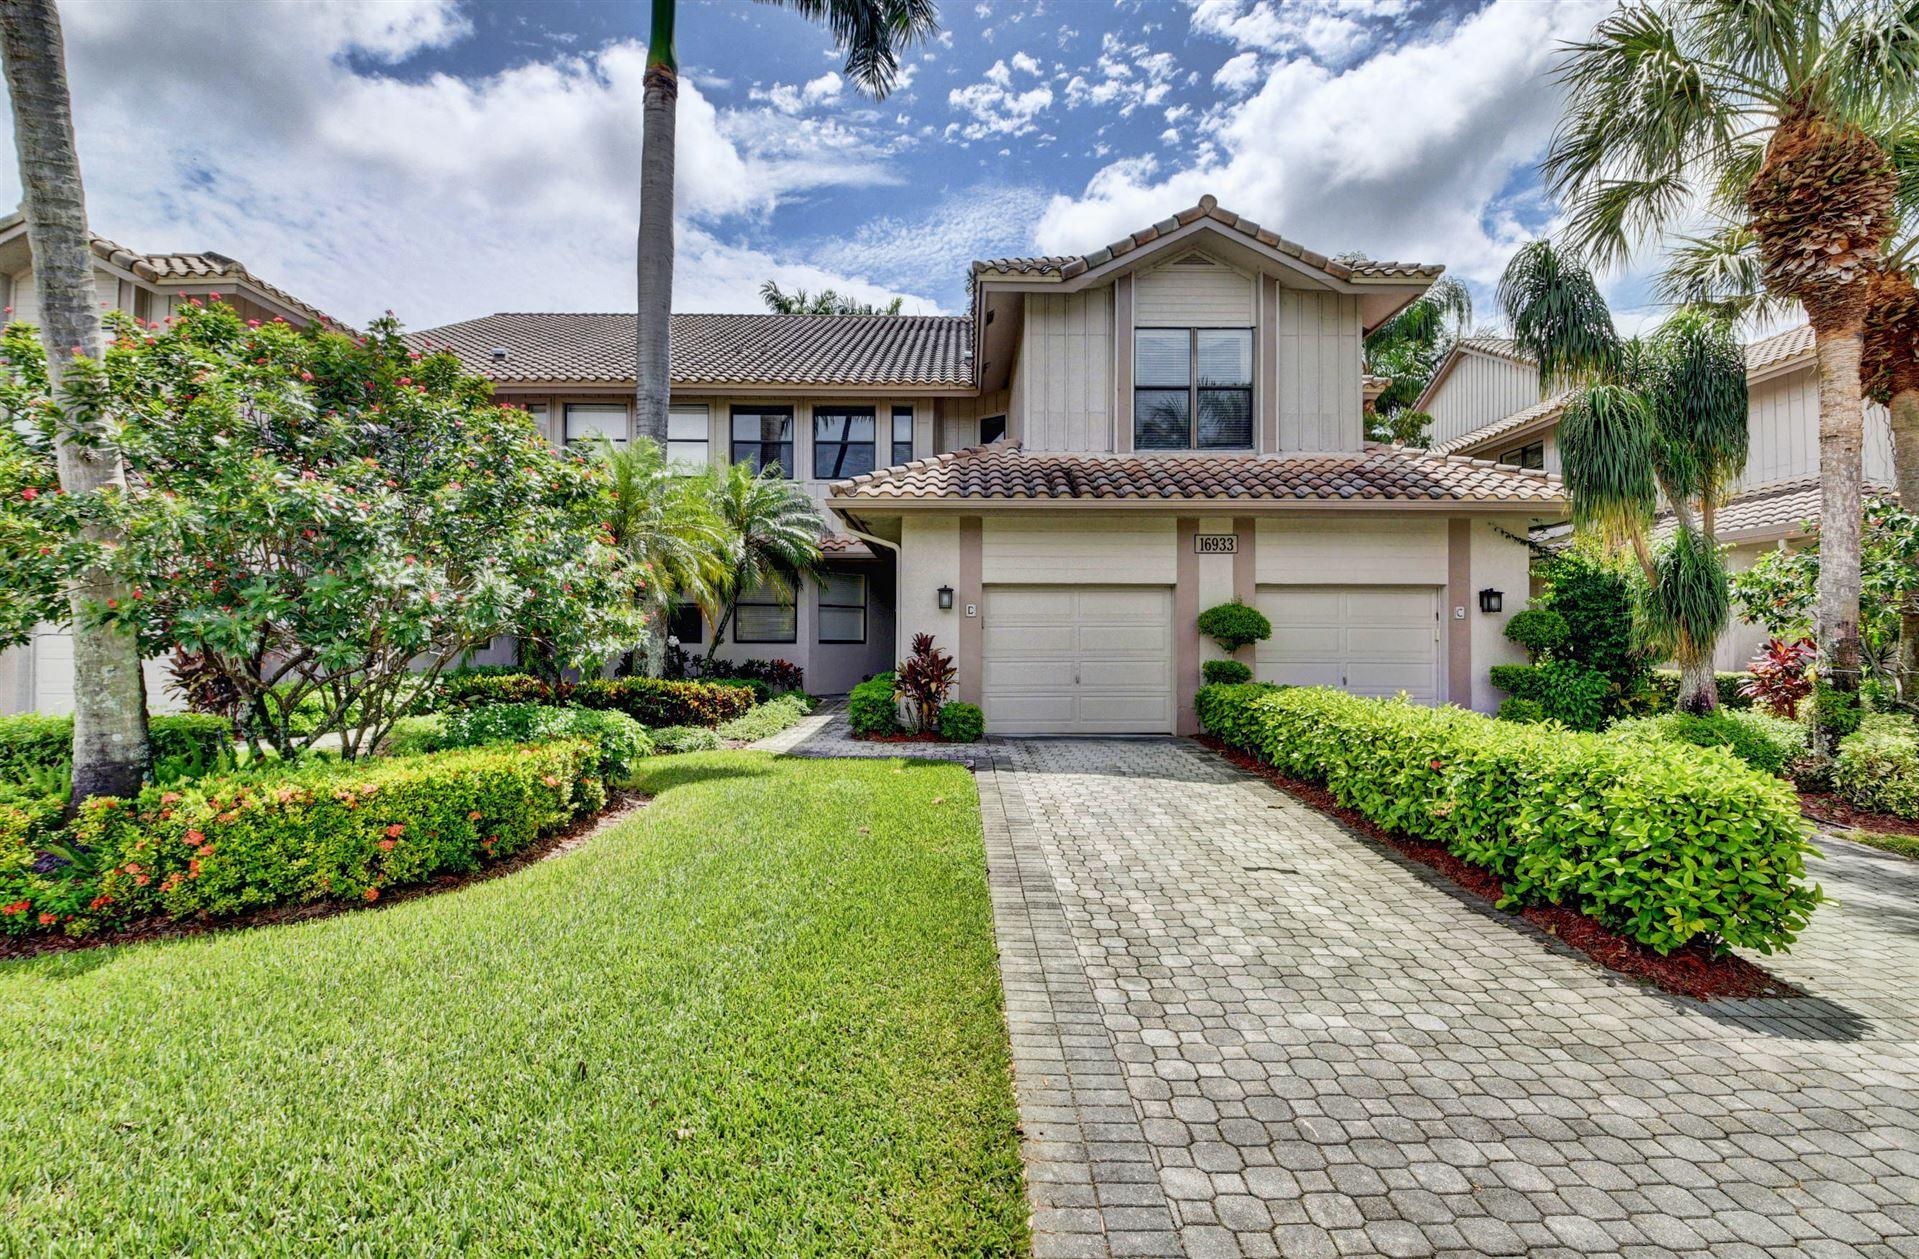 16933 Isle Of Palms Drive #D, Delray Beach, FL 33484 - #: RX-10631575